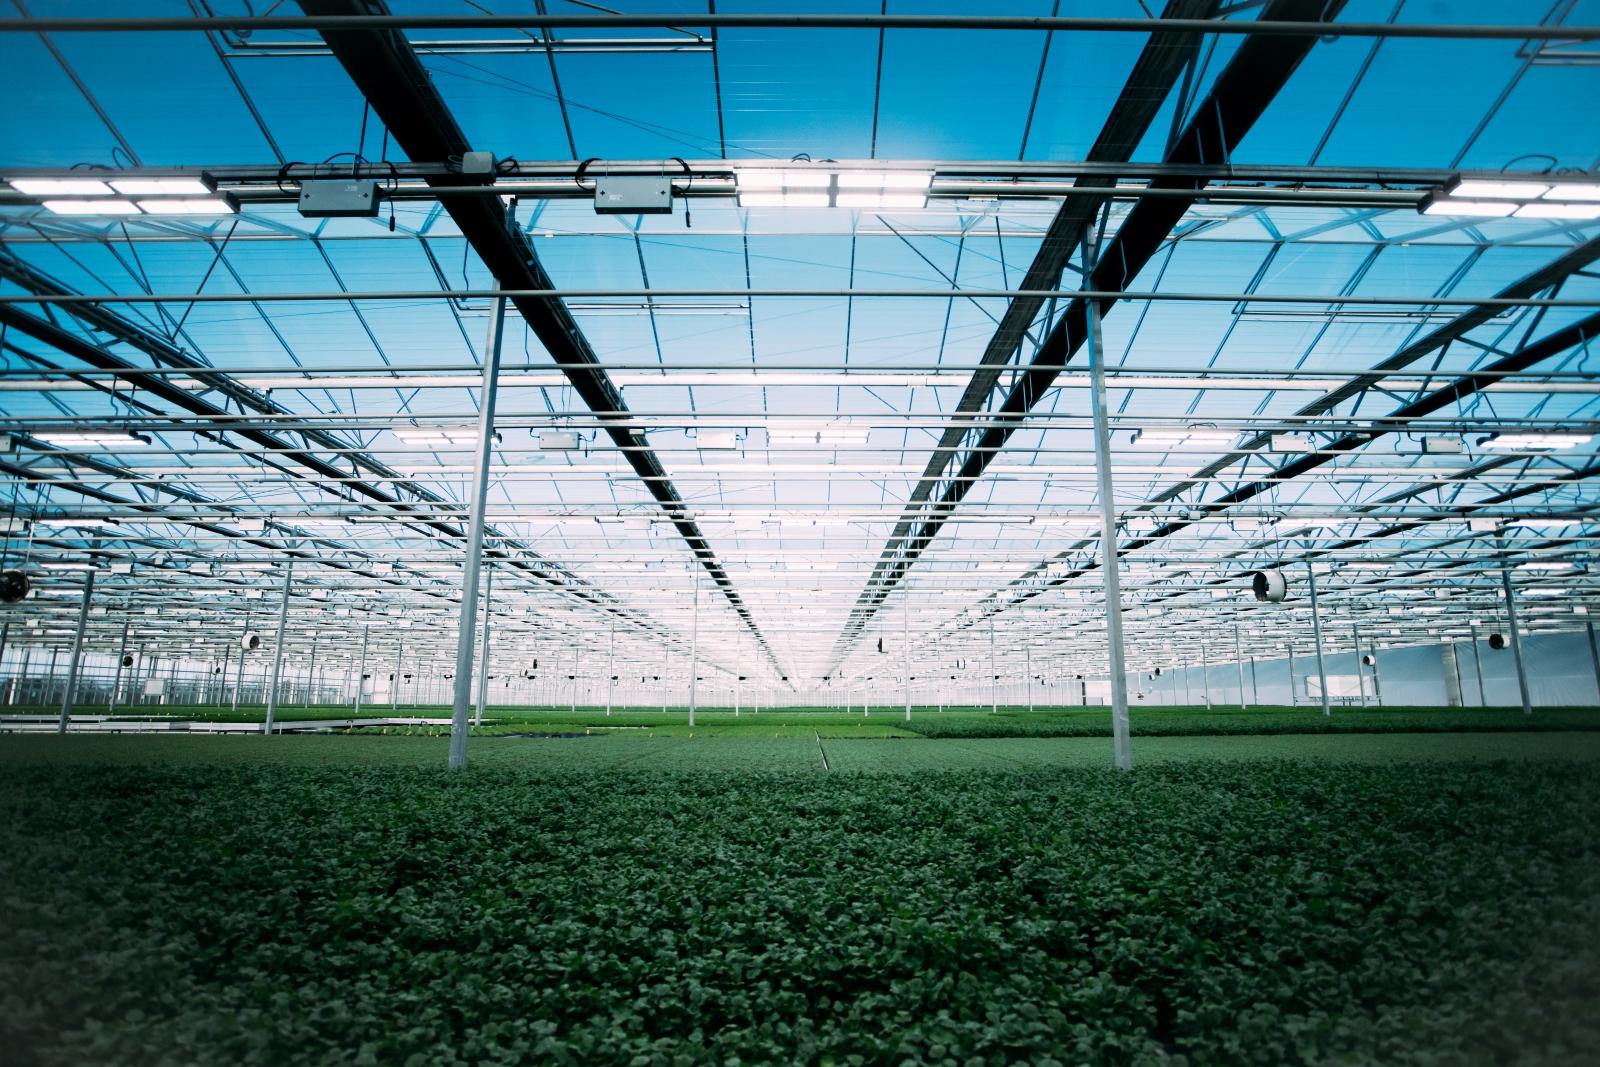 Heliospectra_Greenhouse Sea of Green_Web